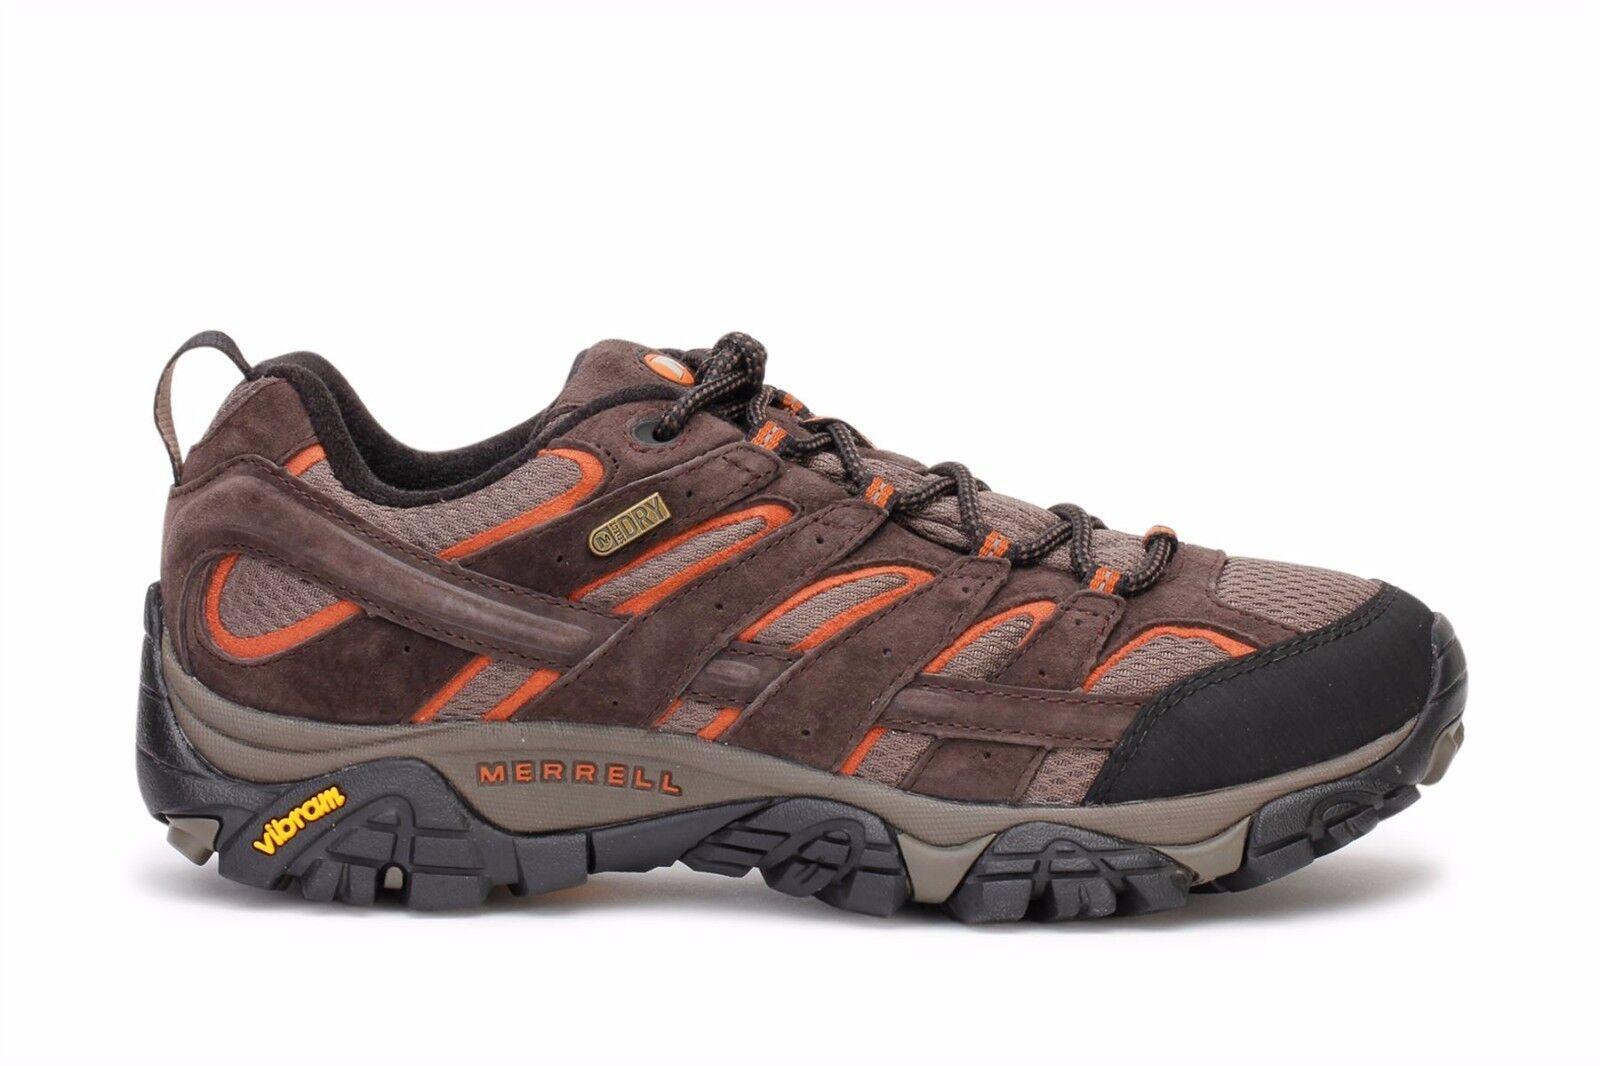 {J06027} Men's Merrell Moab FST Hiking Walking Shoe Espresso *NEW!*